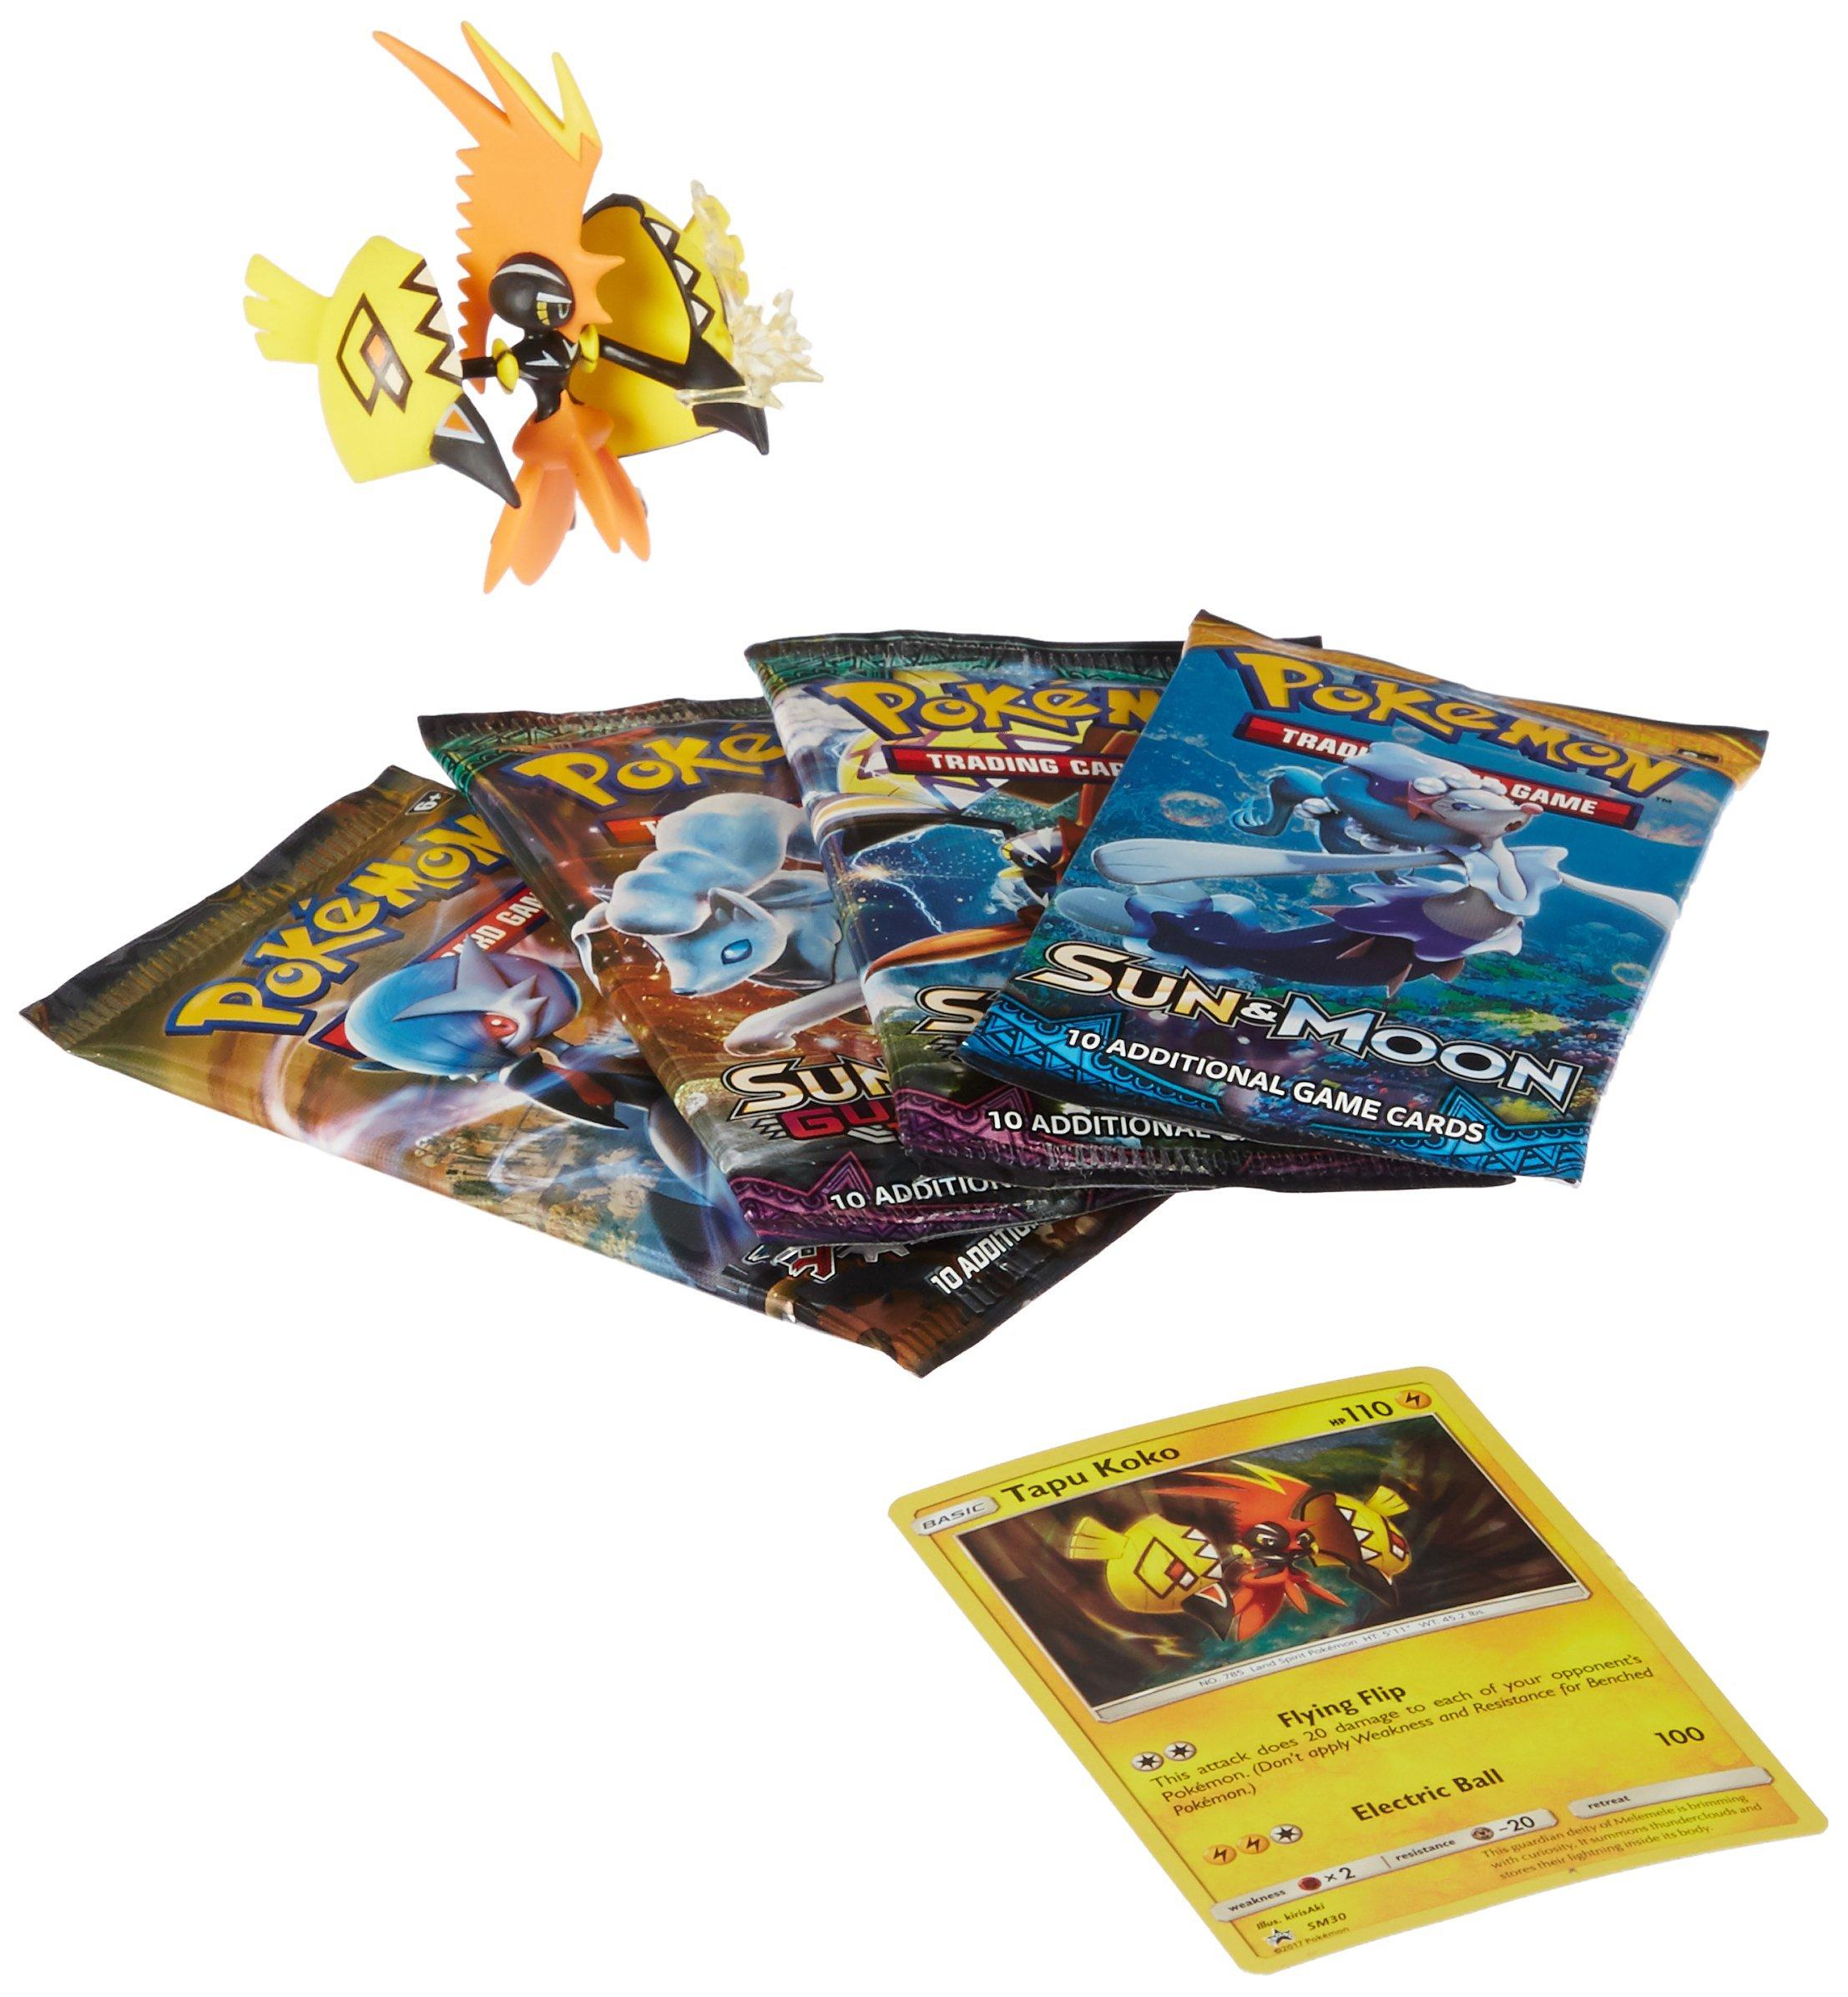 Pokemon TCG: Tapu Koko Figure Pokemon Box Collection - Features 4 Pokemon Booster Packs, Tapu Koko Pokemon Figure, Tapu Koko Pokemon Card and More!